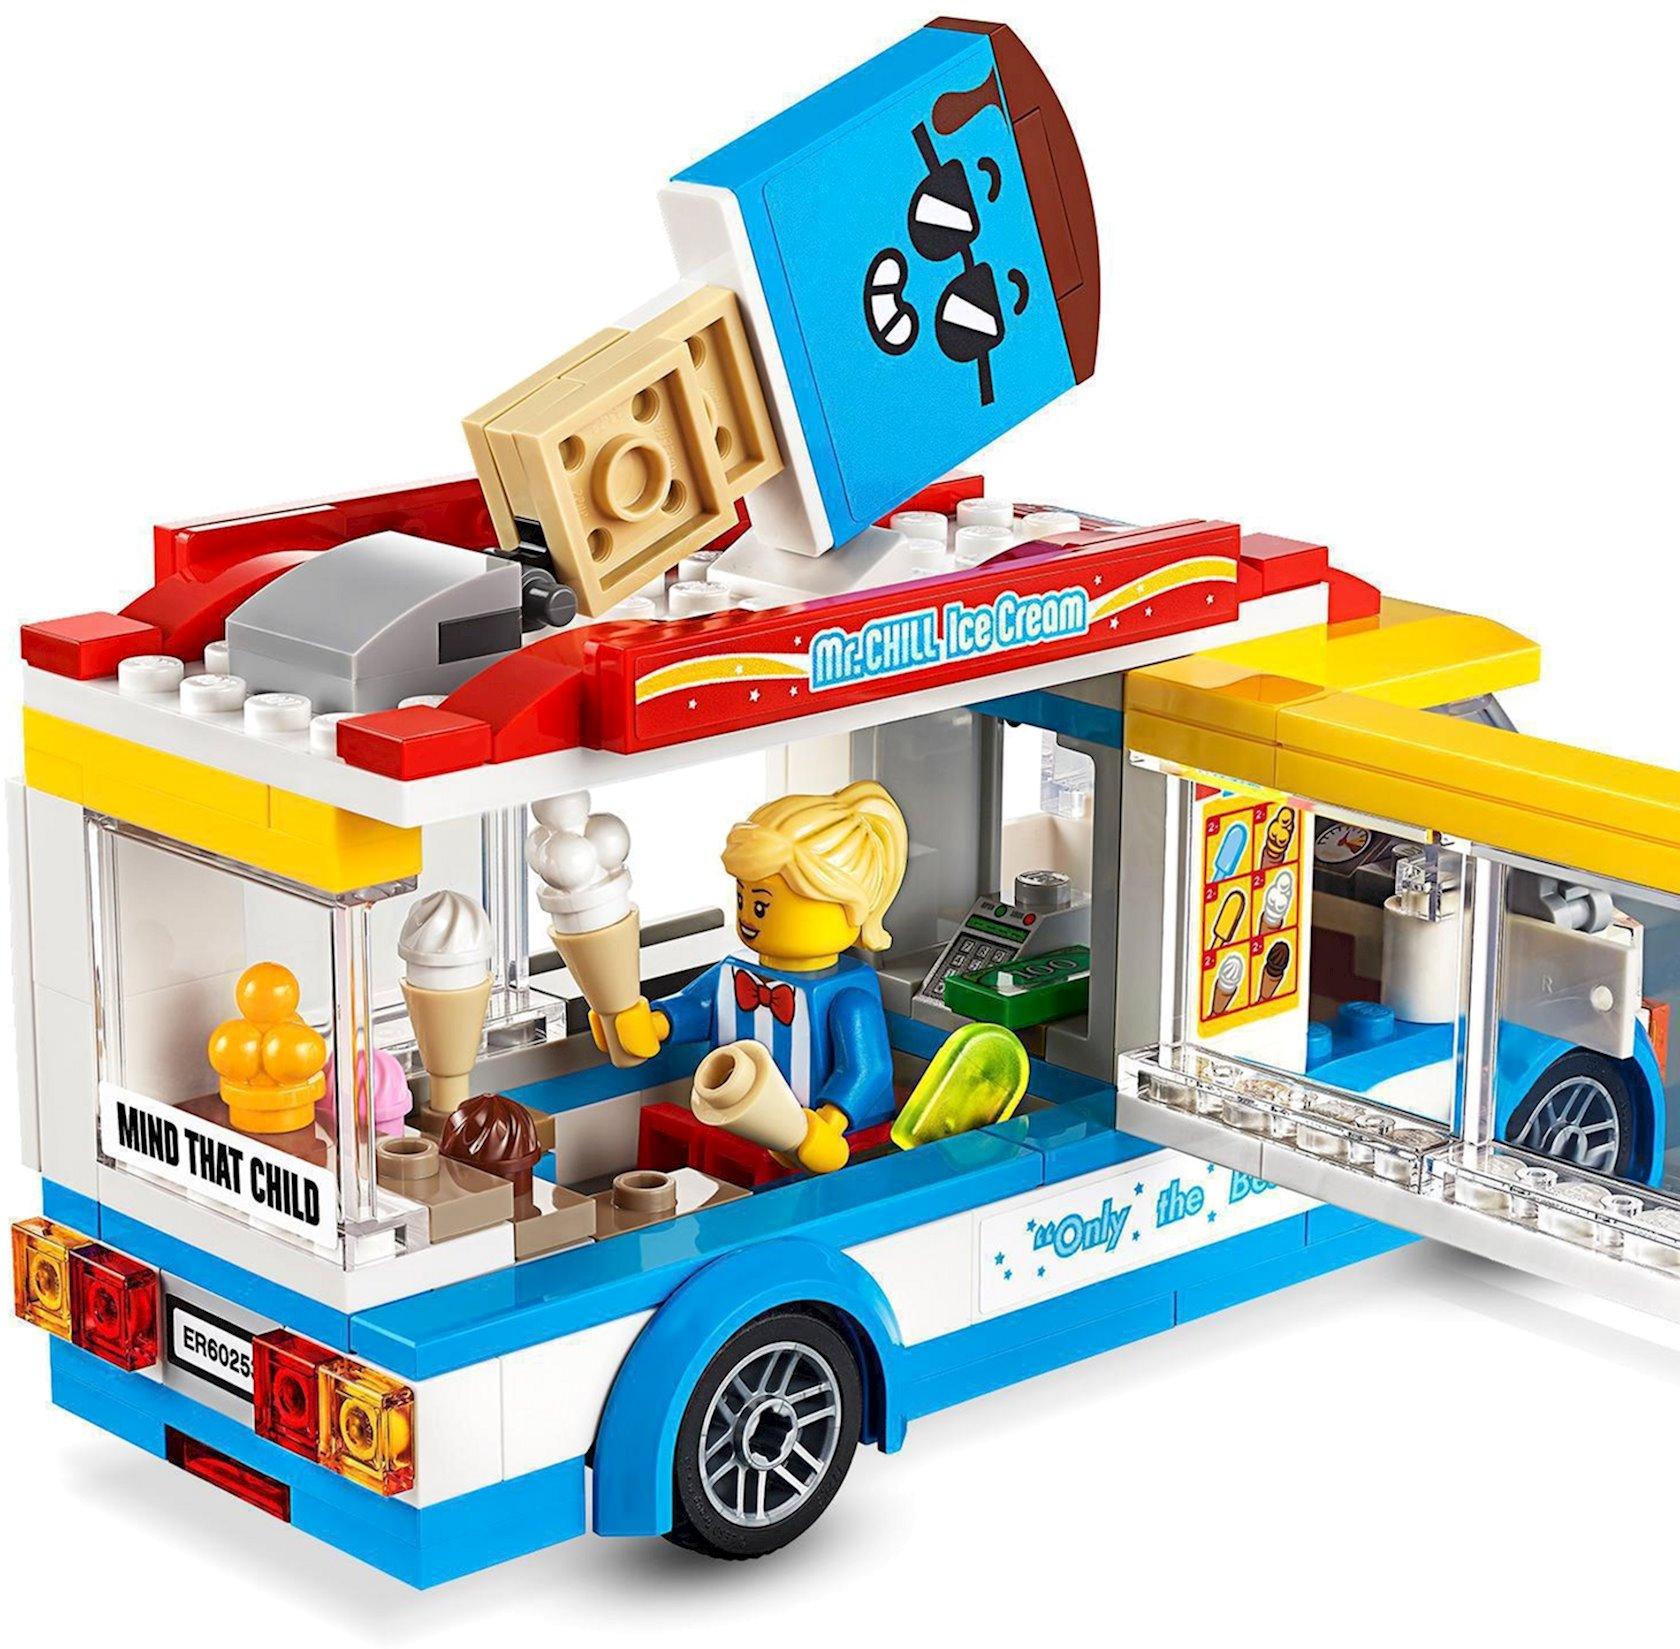 Konstruktor Lego City Dondurma maşını